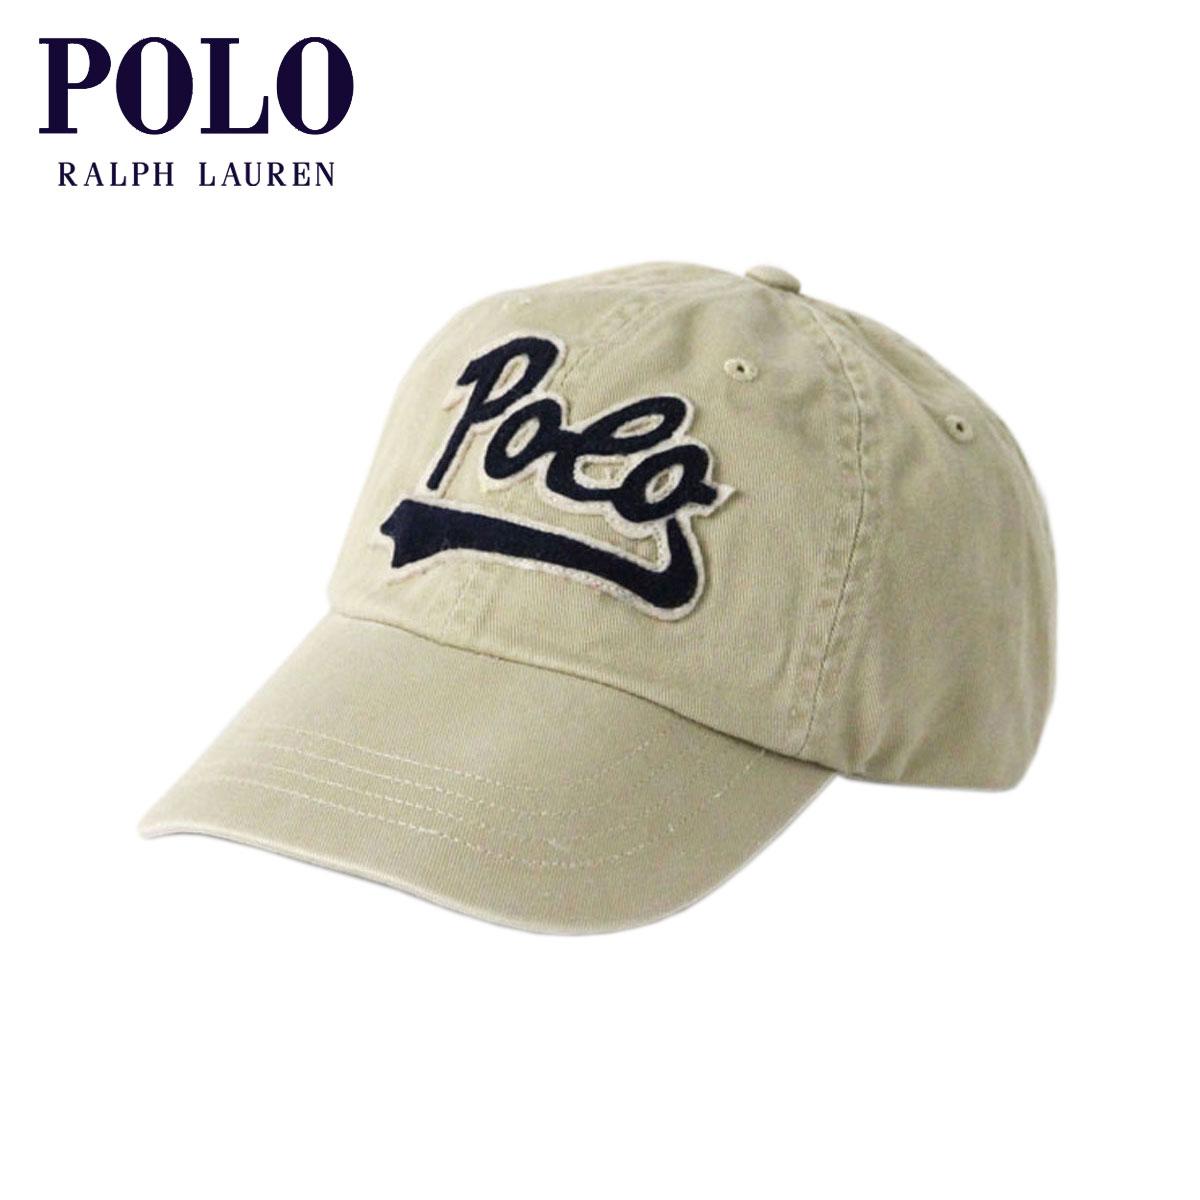 537d9dbecd4be Polo Ralph Lauren POLO RALPH LAUREN regular article men hat cap SCRIPT  COTTON CAP